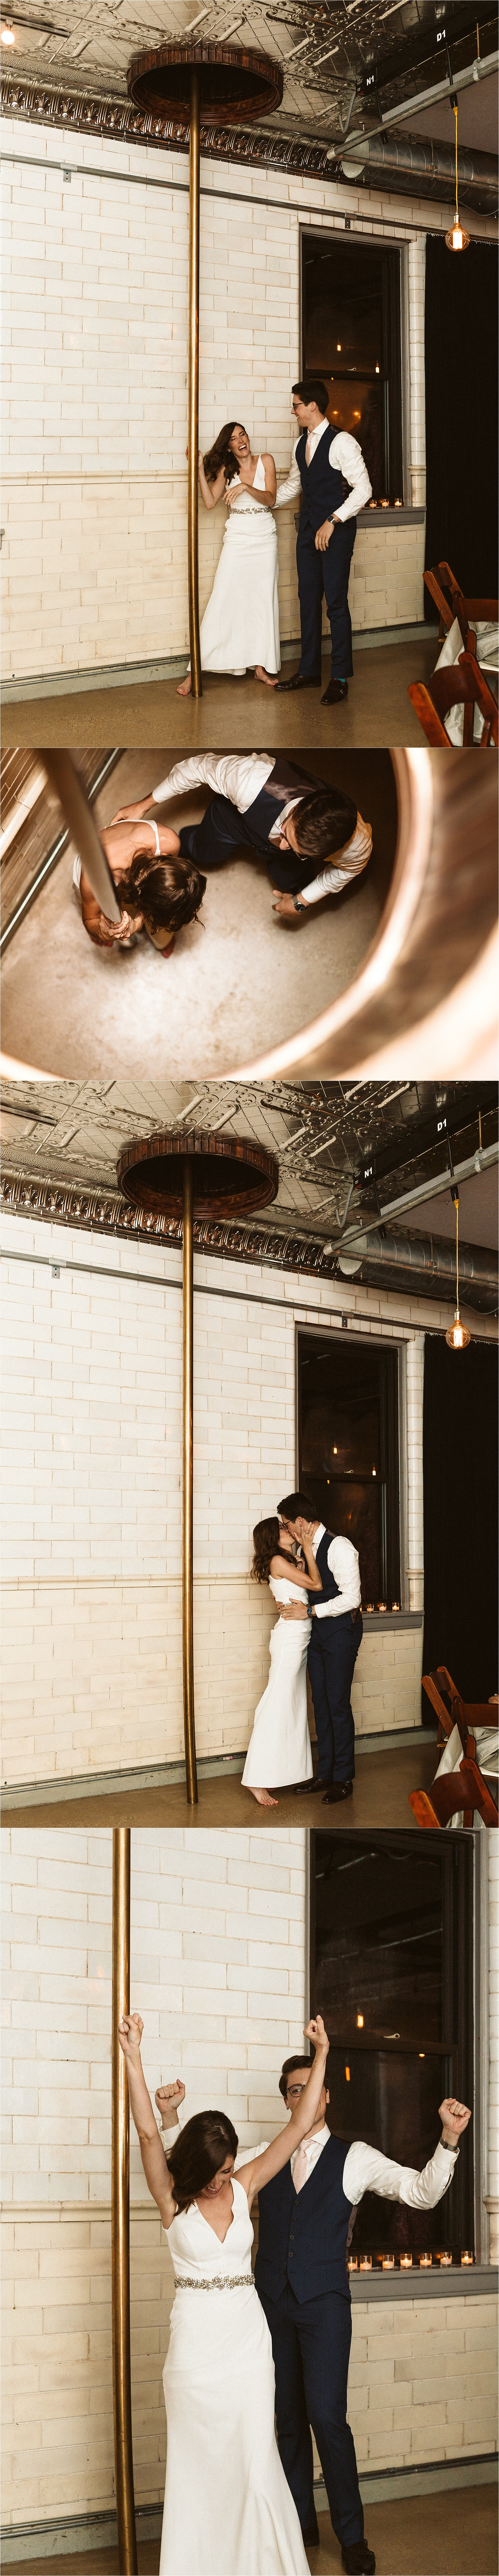 Intimate Firehouse Chicago Wedding_0081.jpg